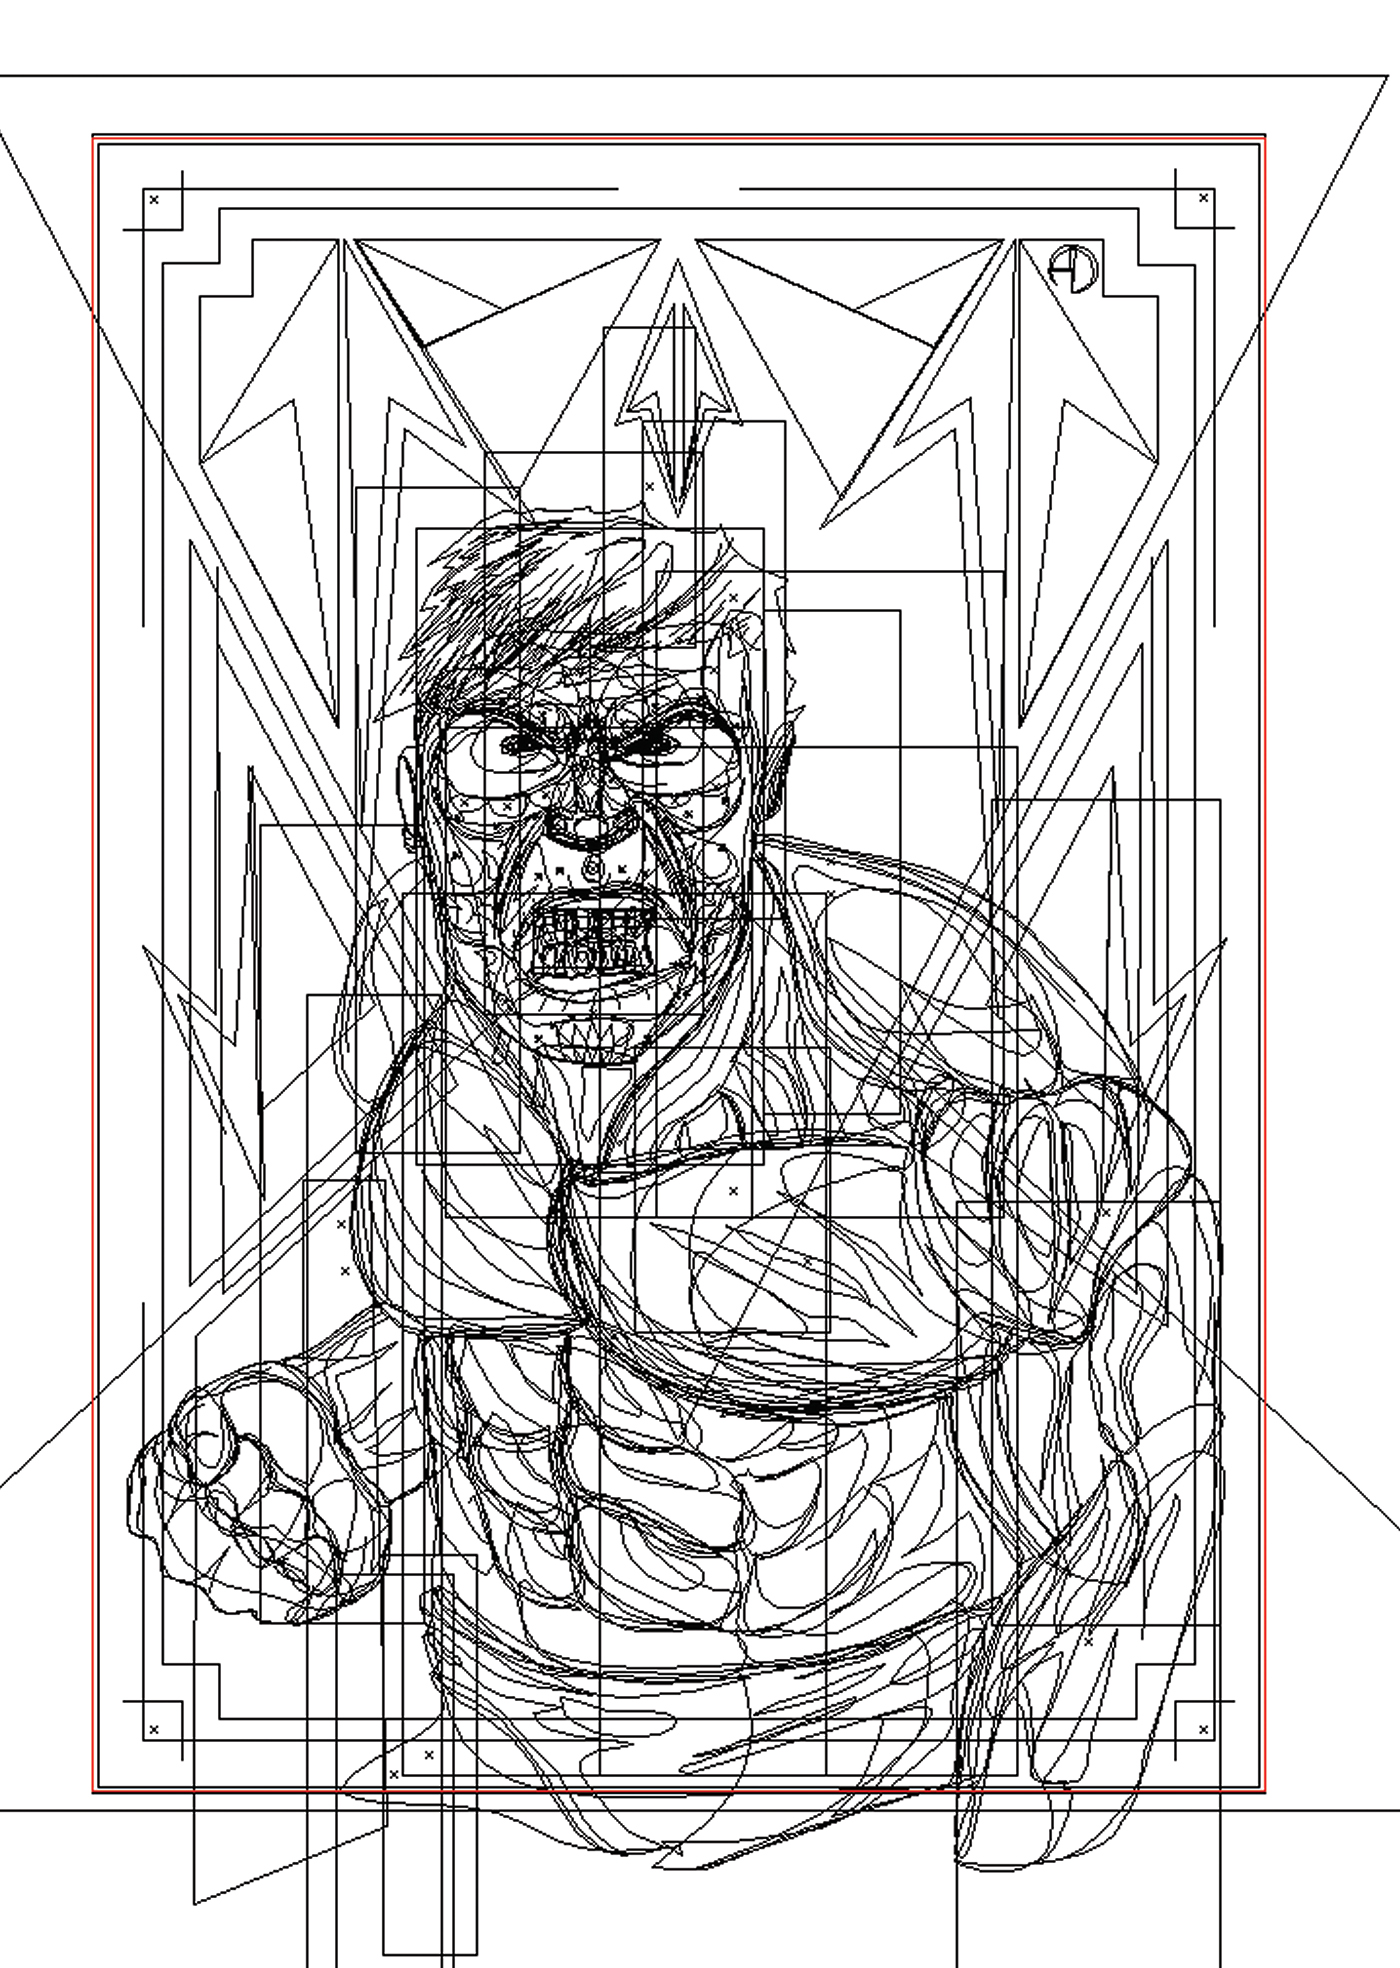 vector vectorart vectordesign ILLUSTRATION  charcterdesign comic marvel Hulk print poster